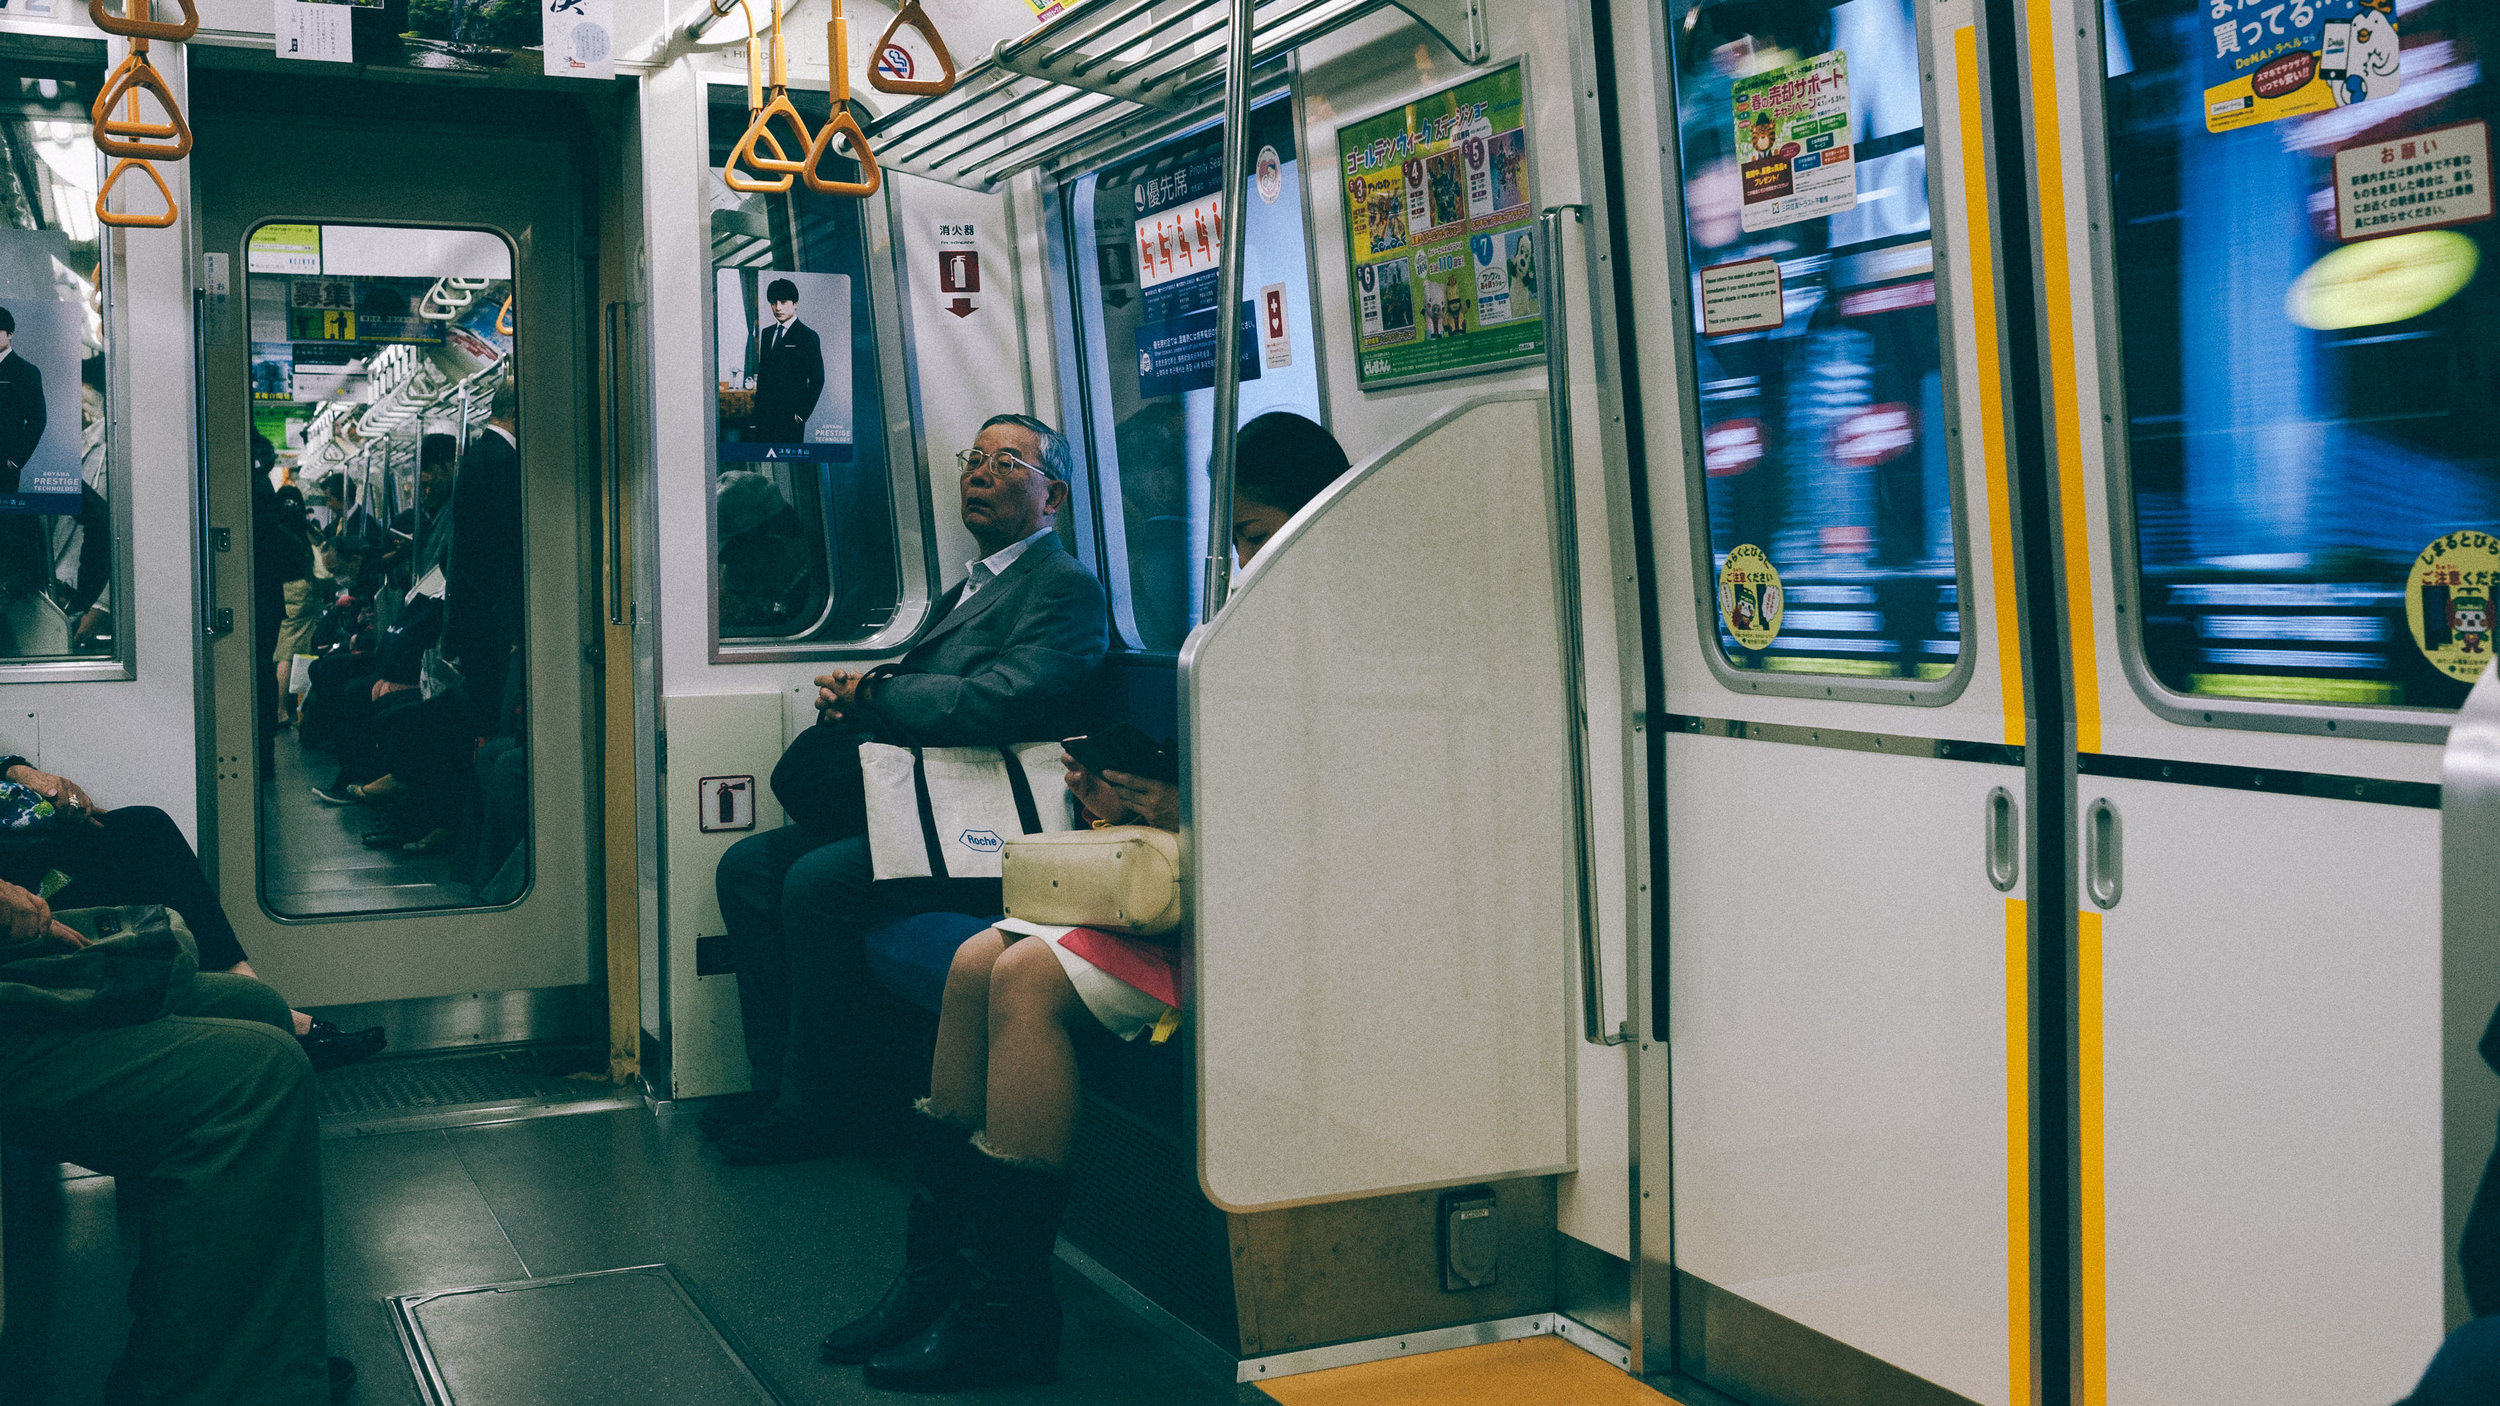 tokyo-metro-old-man-scenejpg.jpg